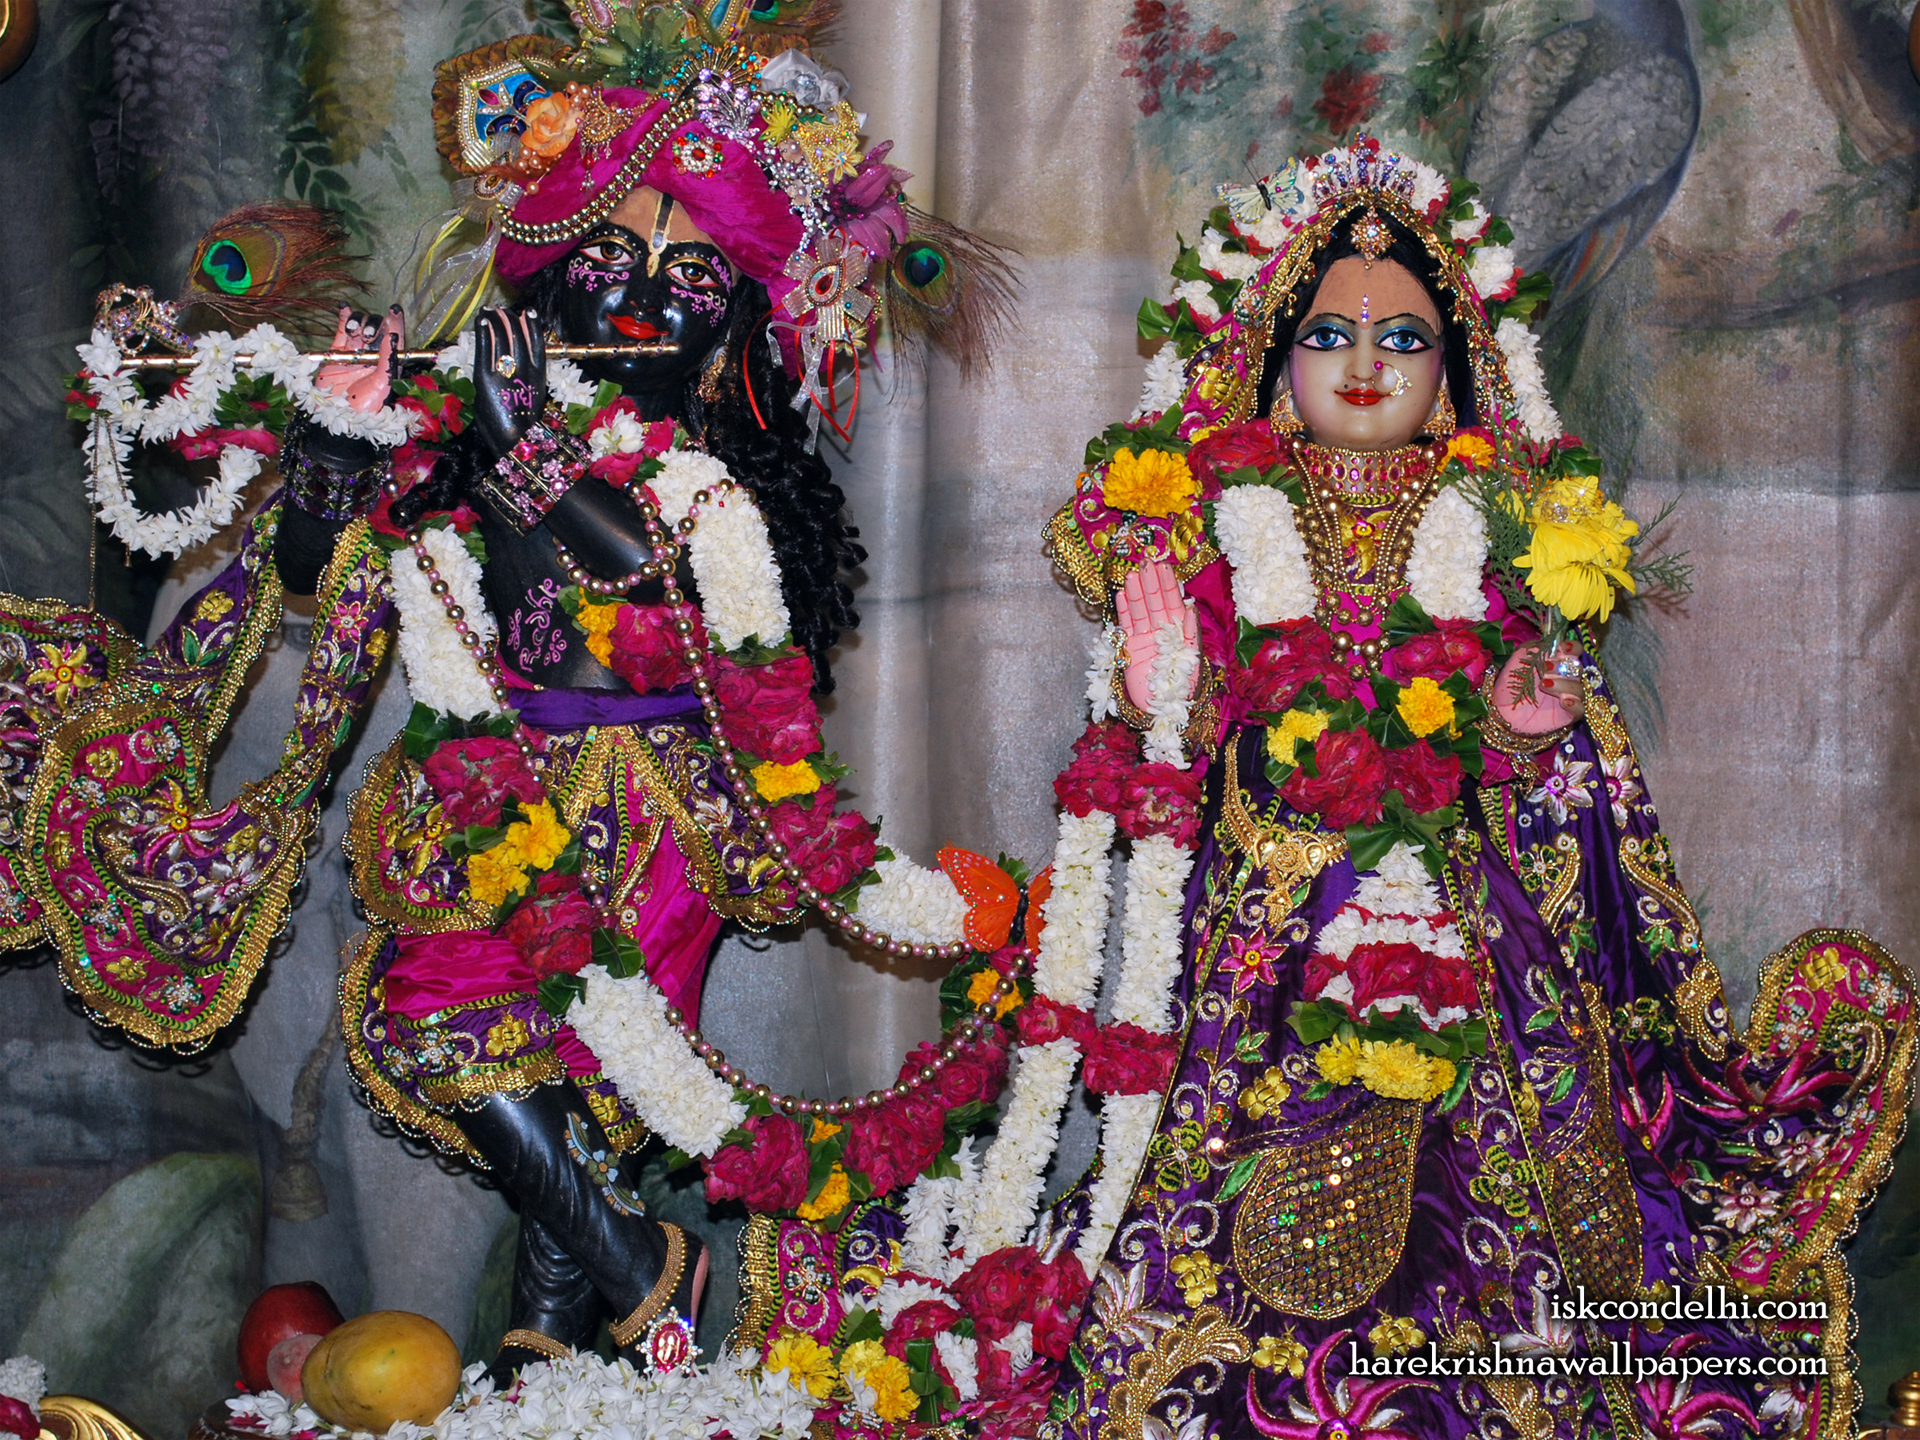 Sri Sri Radha Parthasarathi Wallpaper (002) Size 1920x1440 Download